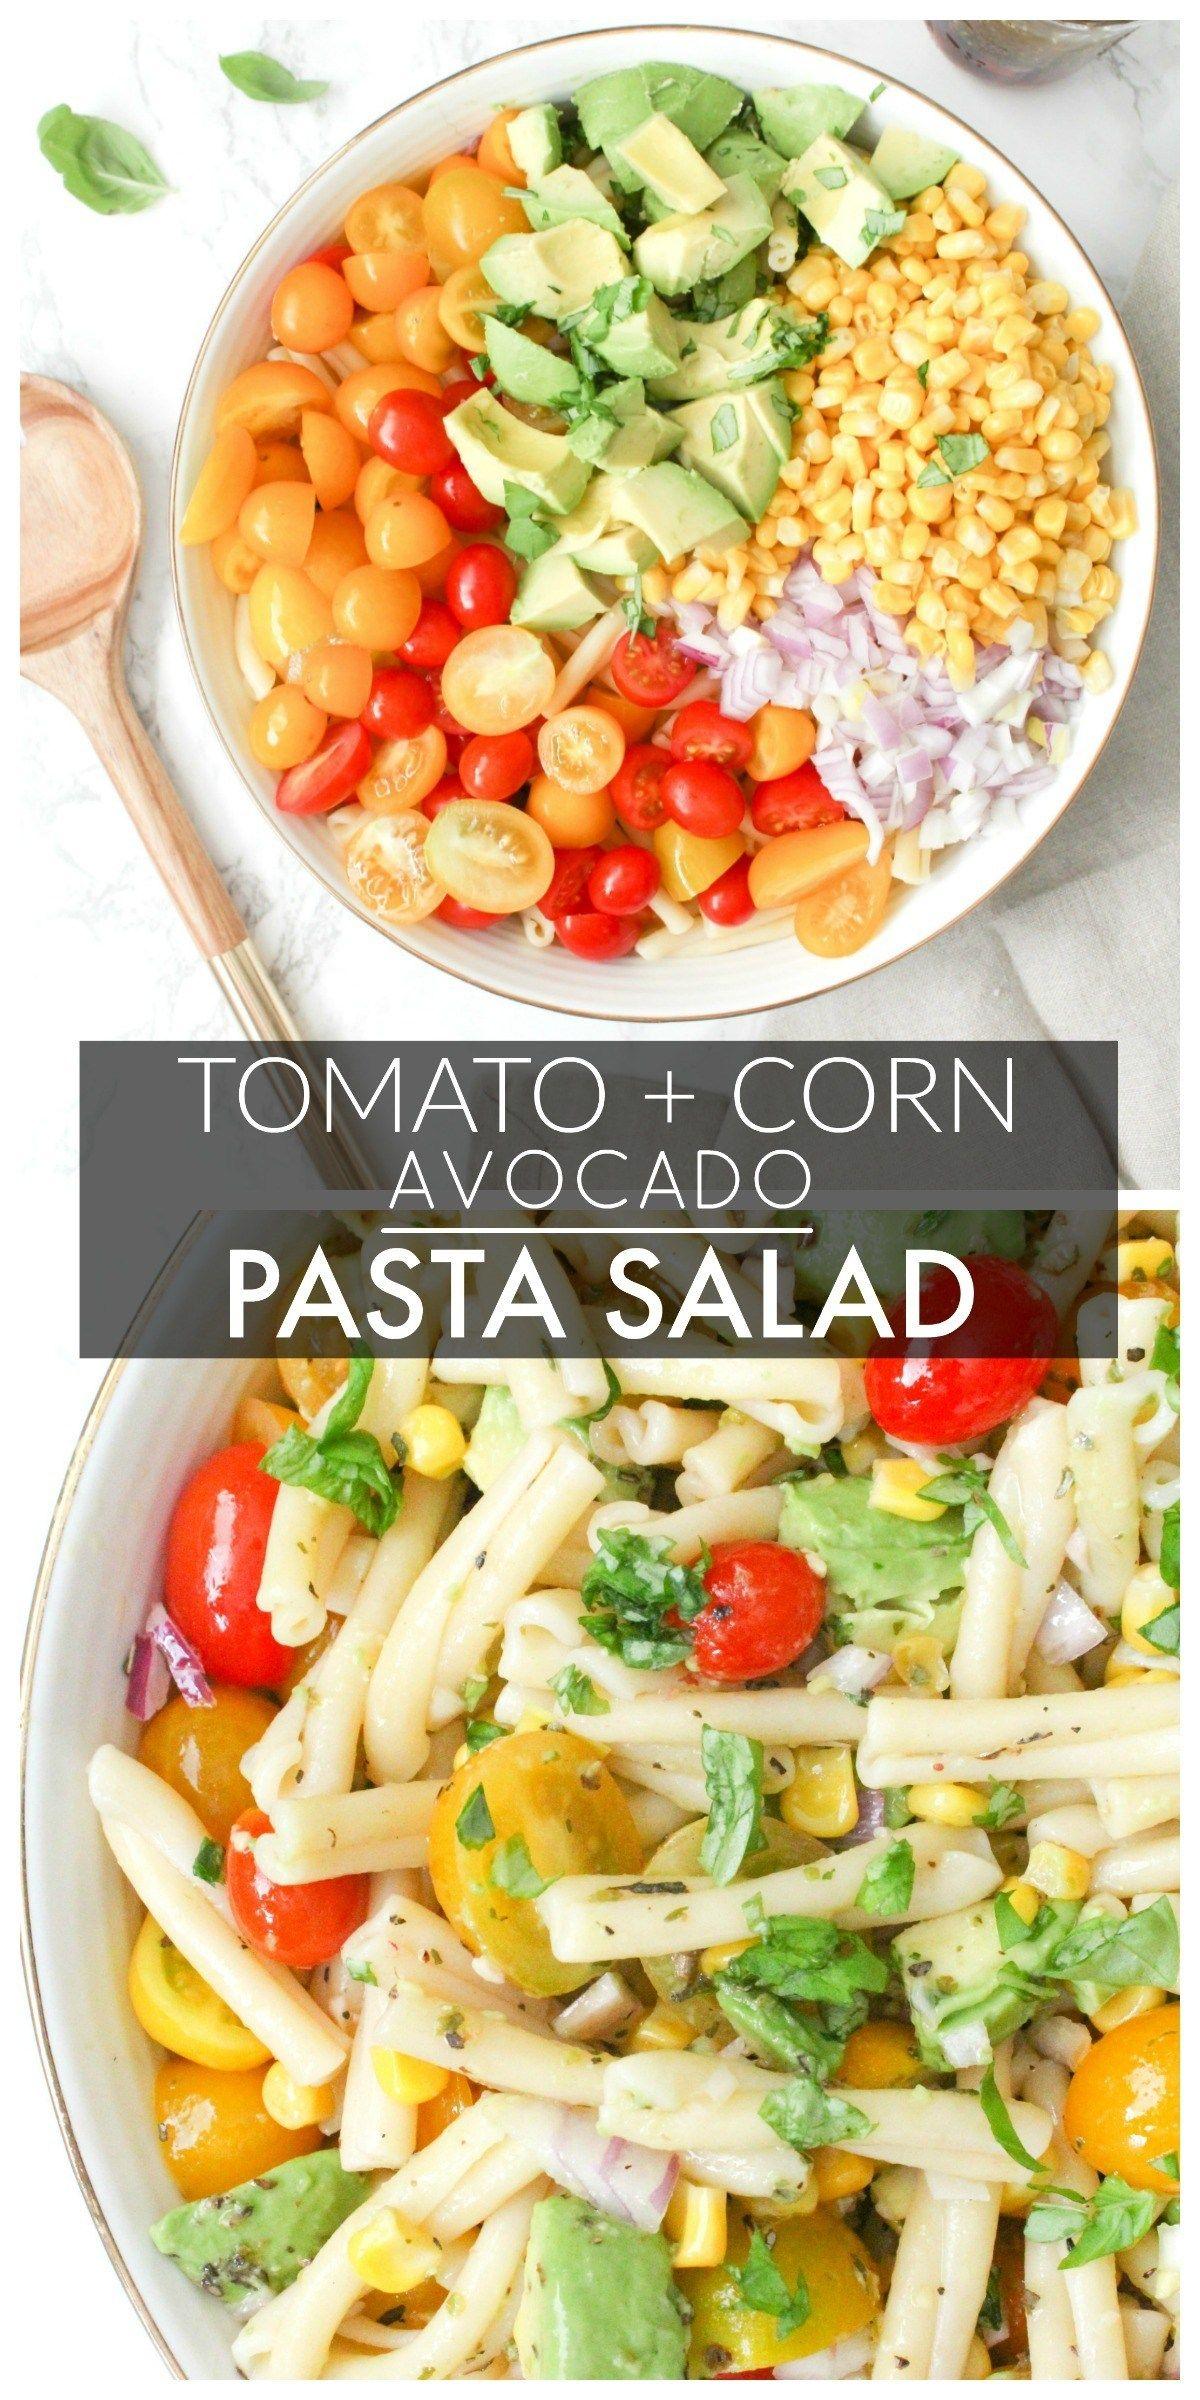 Tomato Corn Avocado Pasta Salad